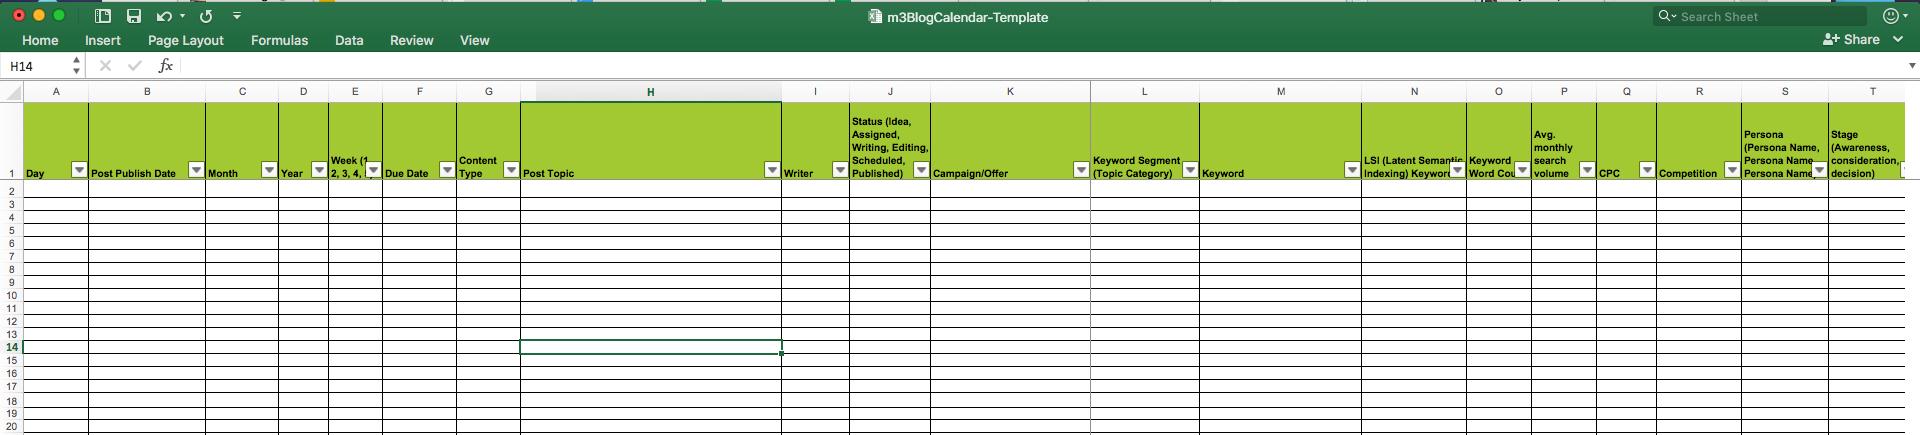 Spreadsheet Calendar Template Regarding Editorial Calendar Templates For Content Marketing: The Ultimate List